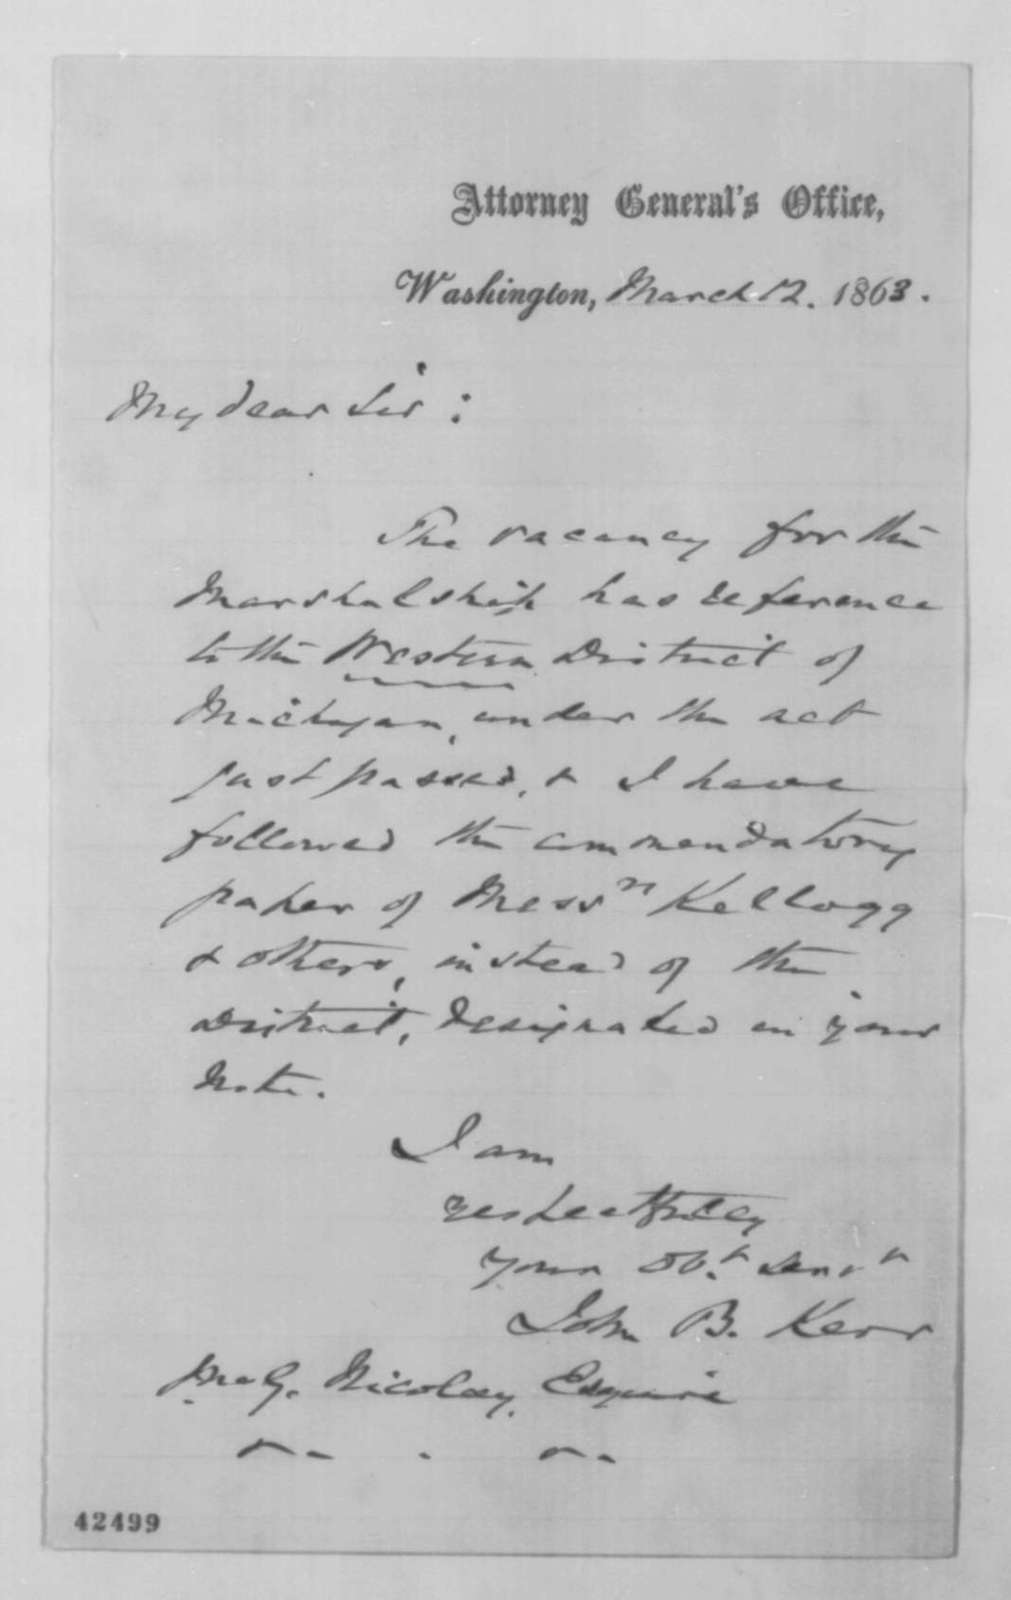 John B. Kerr to John G. Nicolay, Thursday, March 12, 1863  (Appointment)